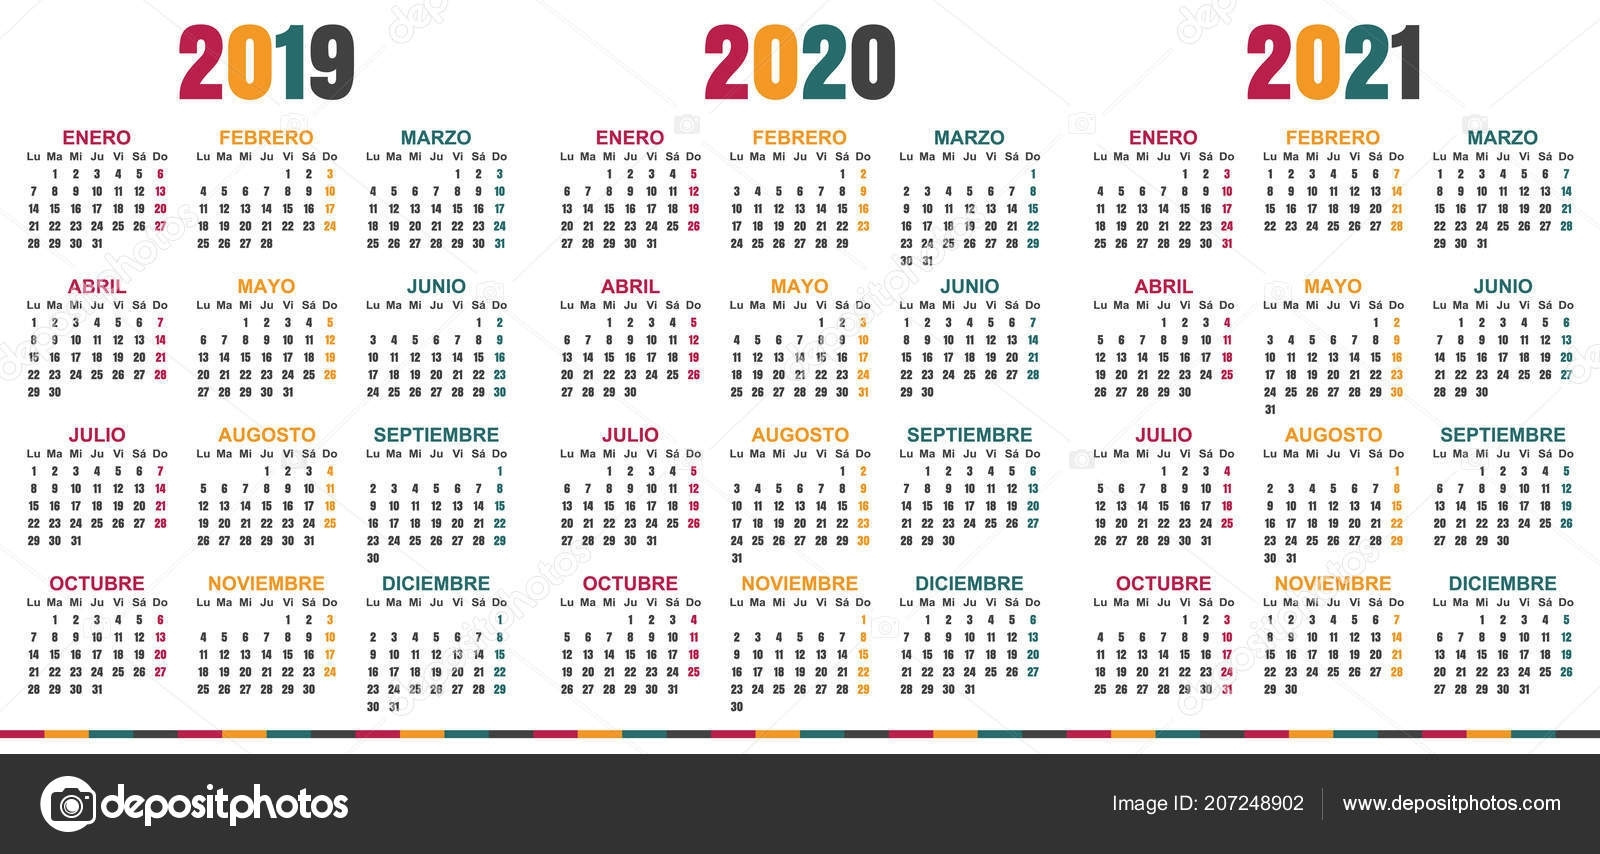 ᐈ Calendar 2021 Stock Vectors, Royalty Free 2021 Calendar